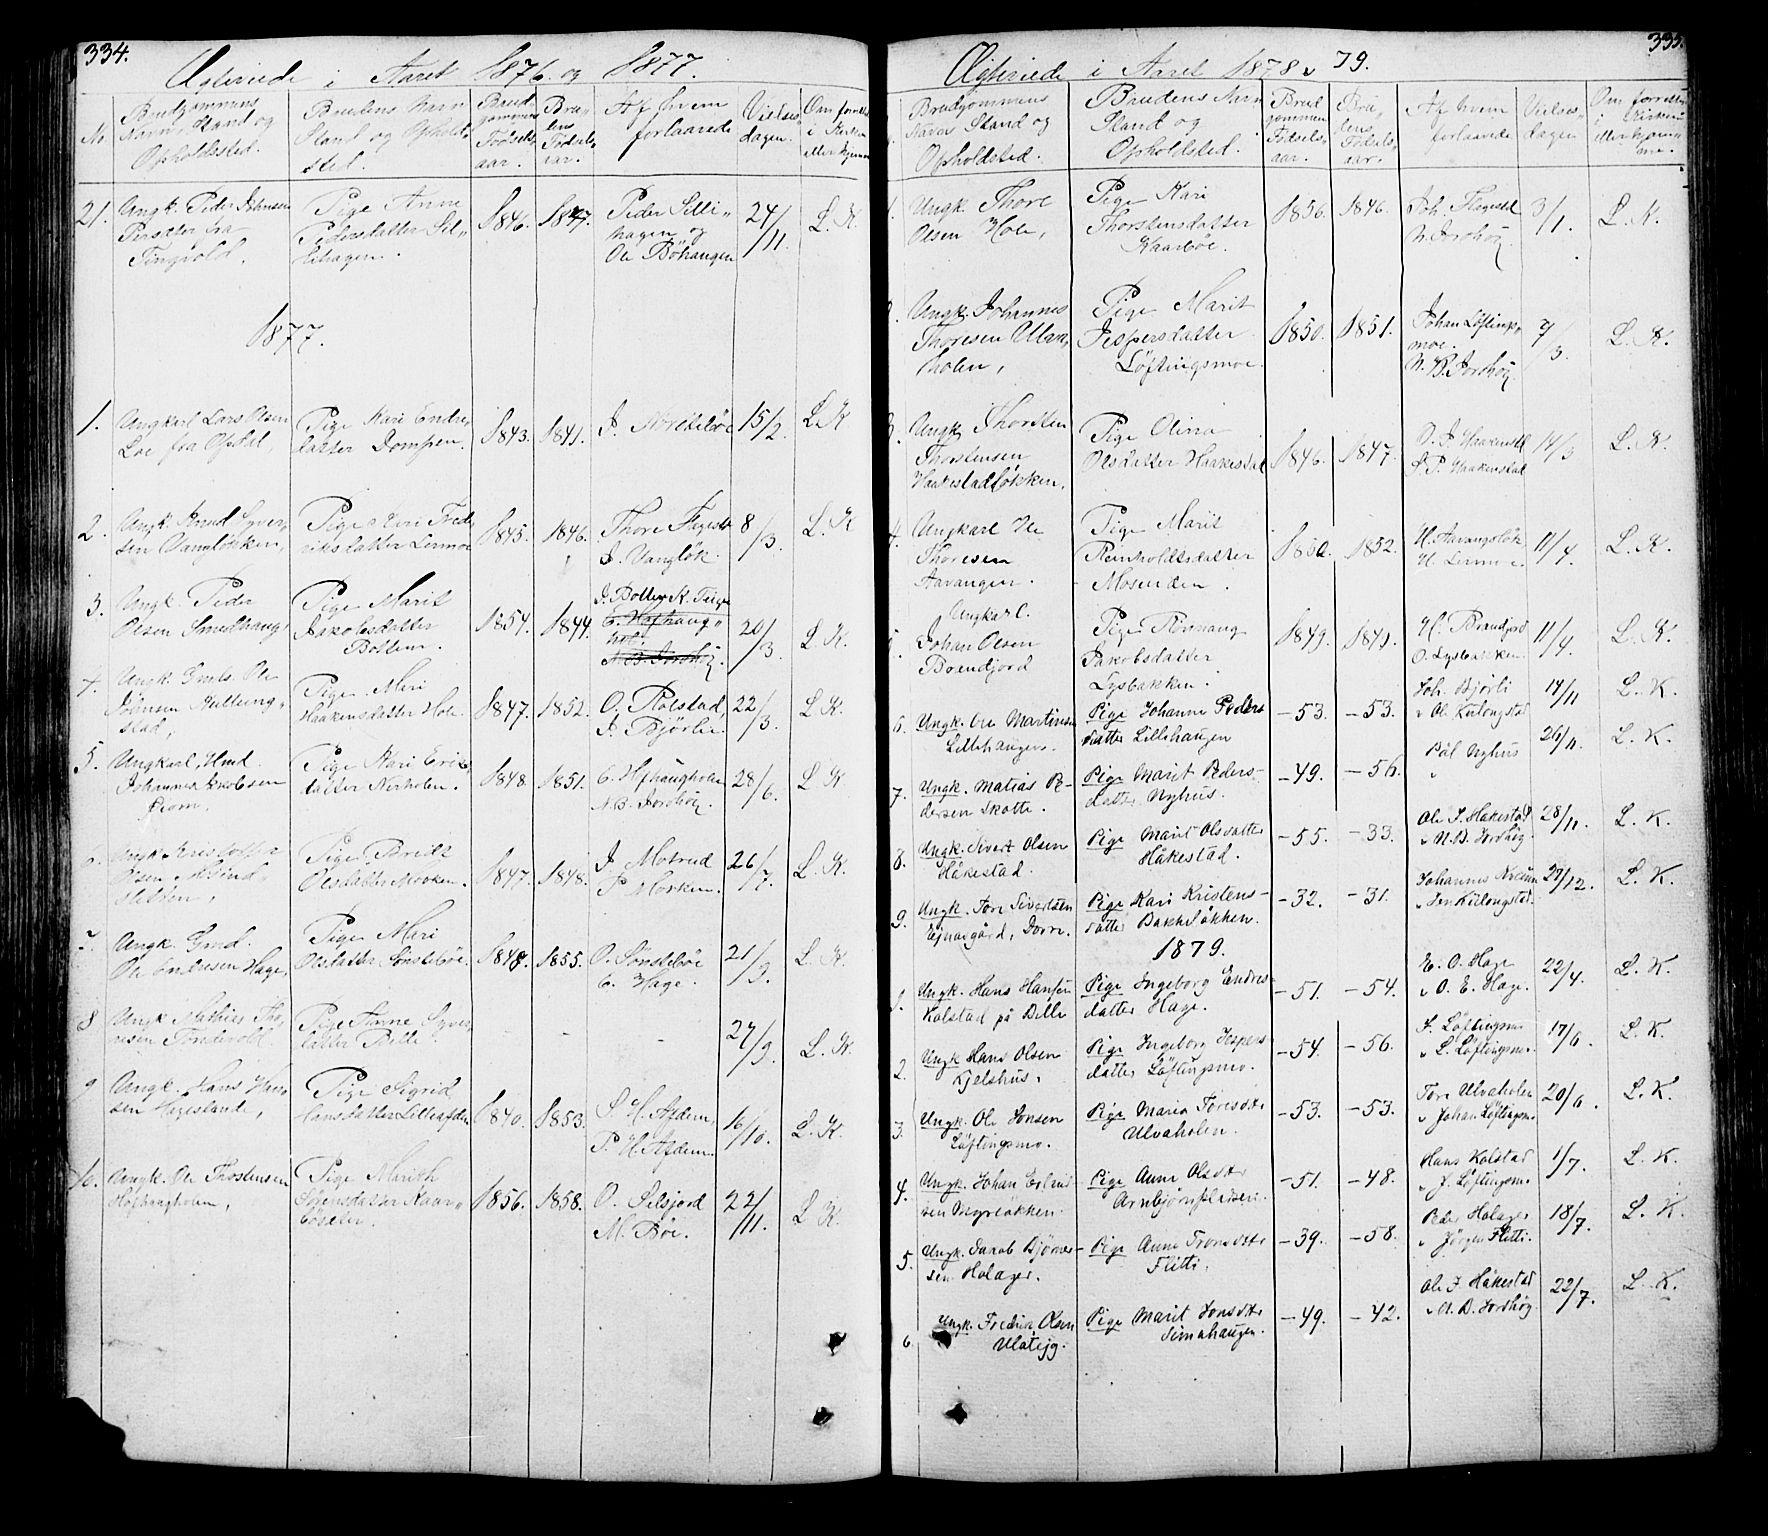 SAH, Lesja prestekontor, Klokkerbok nr. 5, 1850-1894, s. 334-335